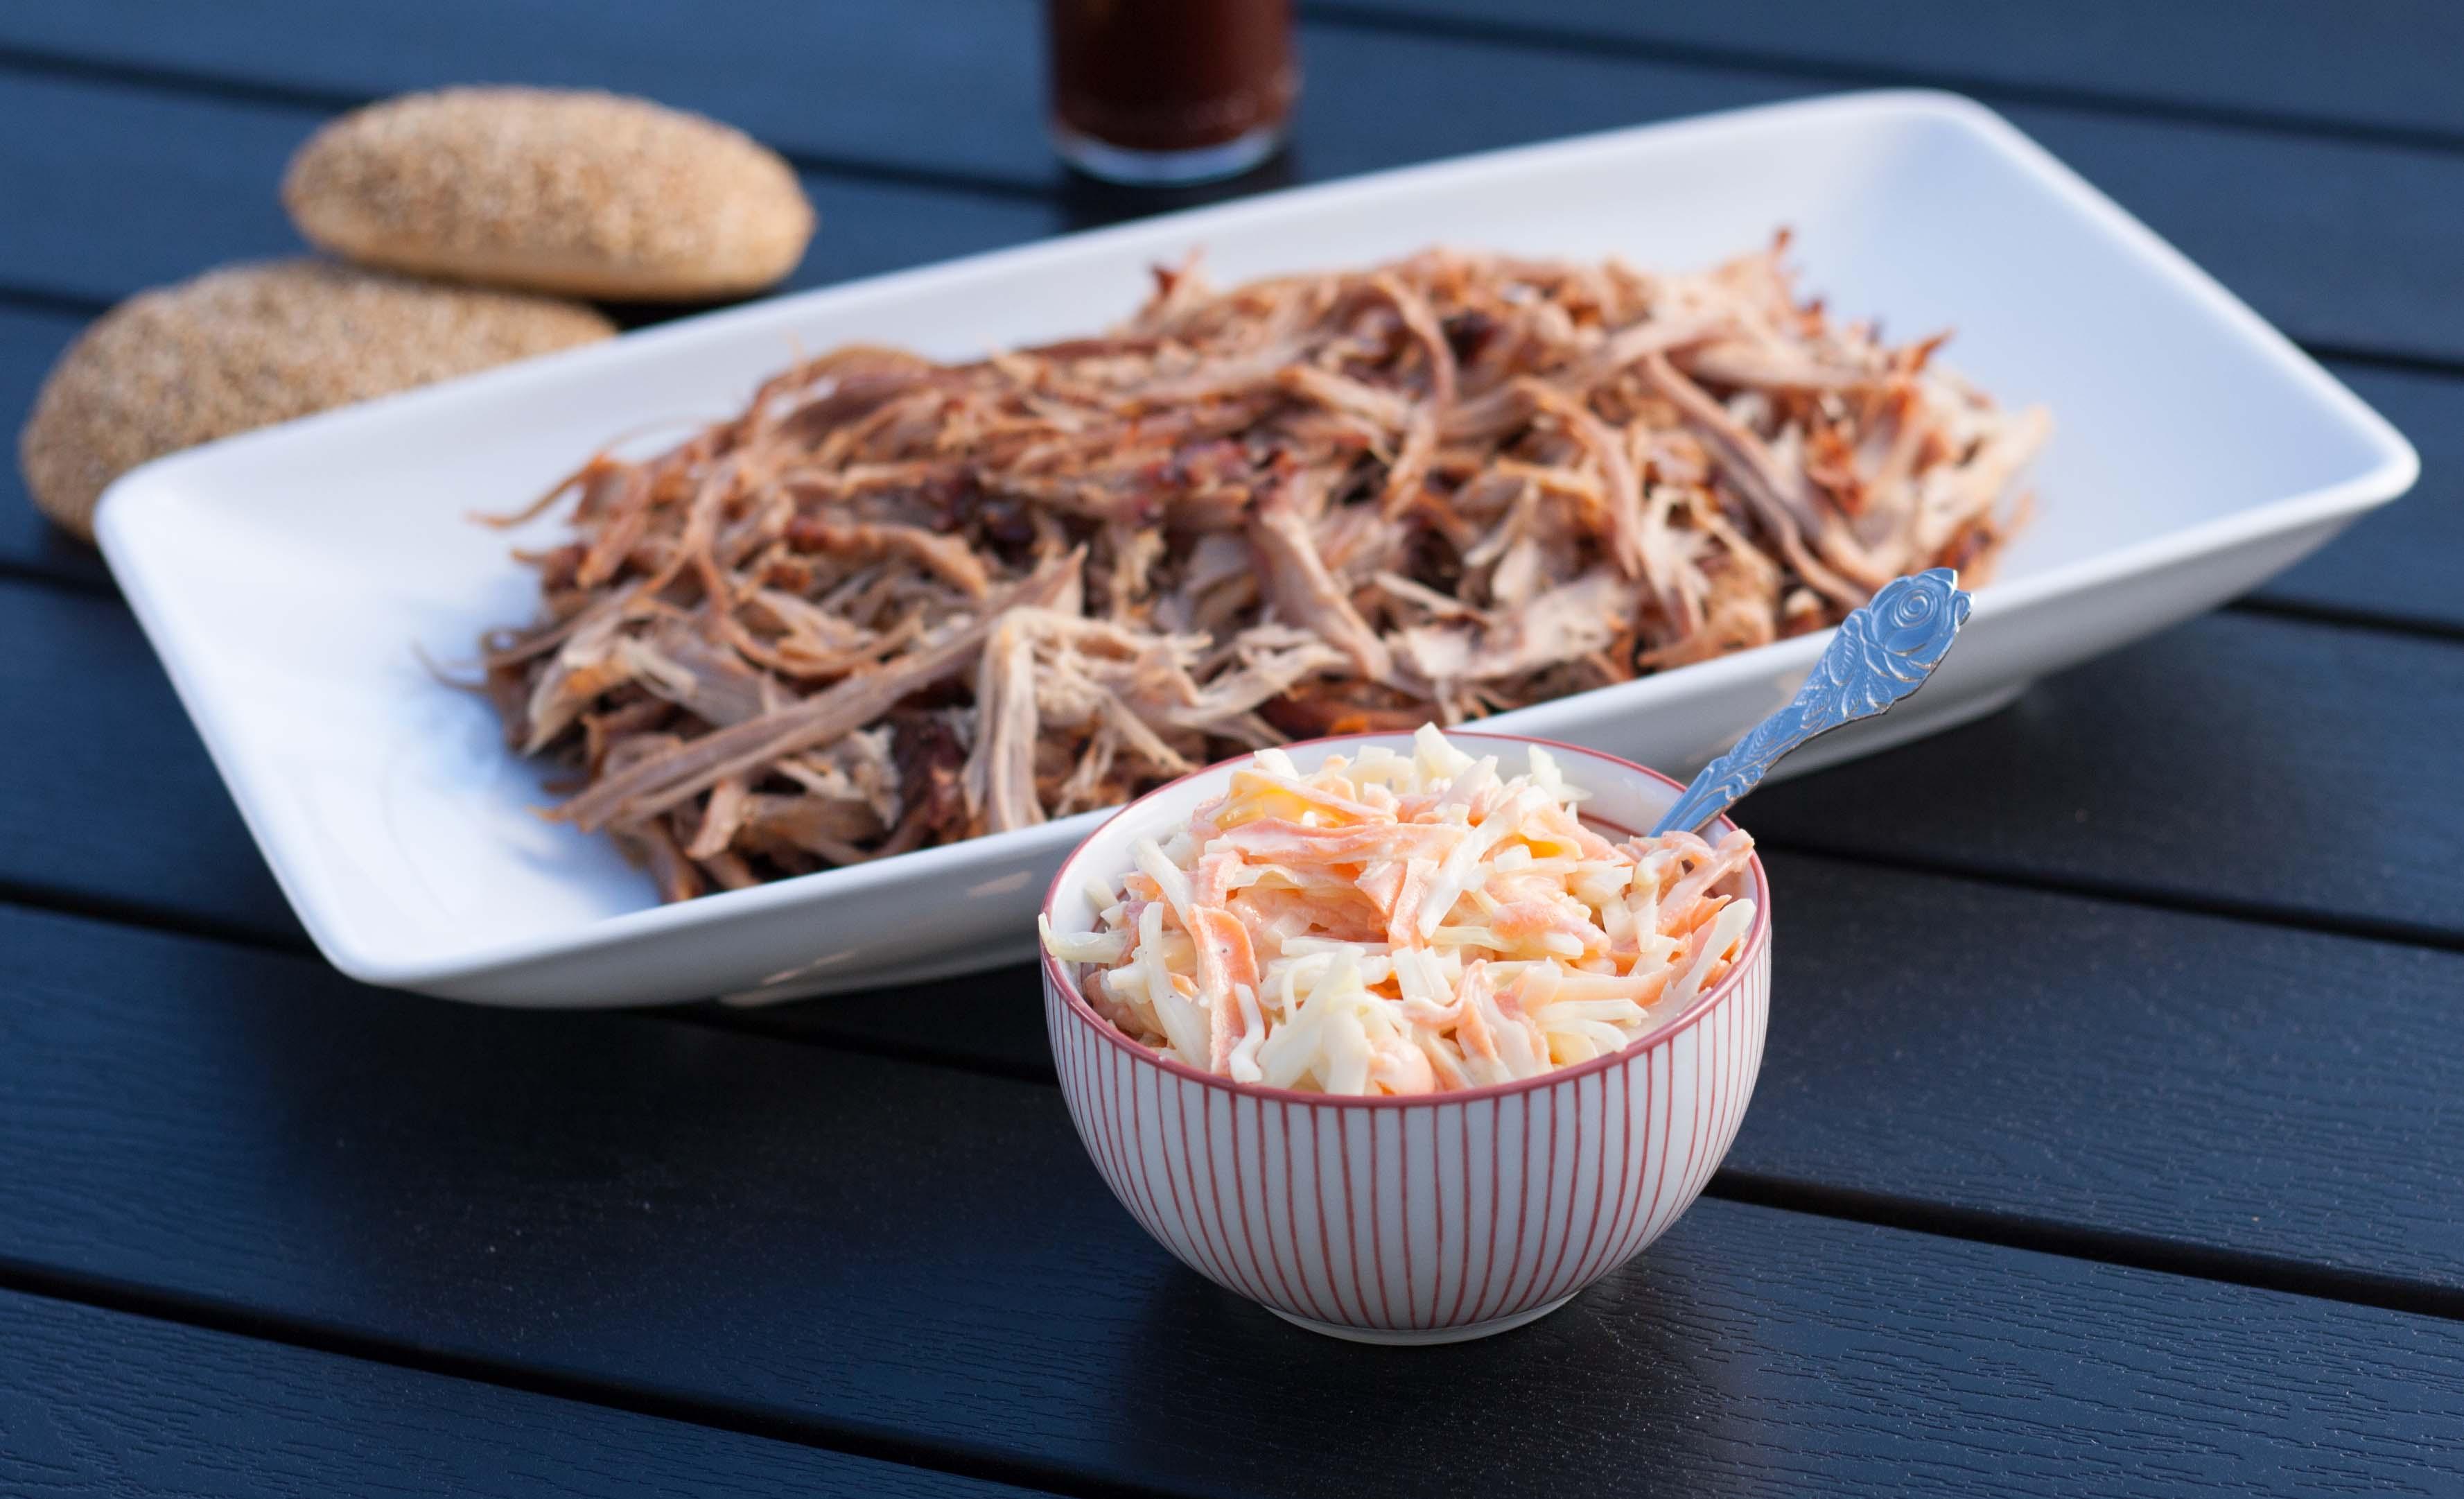 Recipe for Homemade Coleslaw